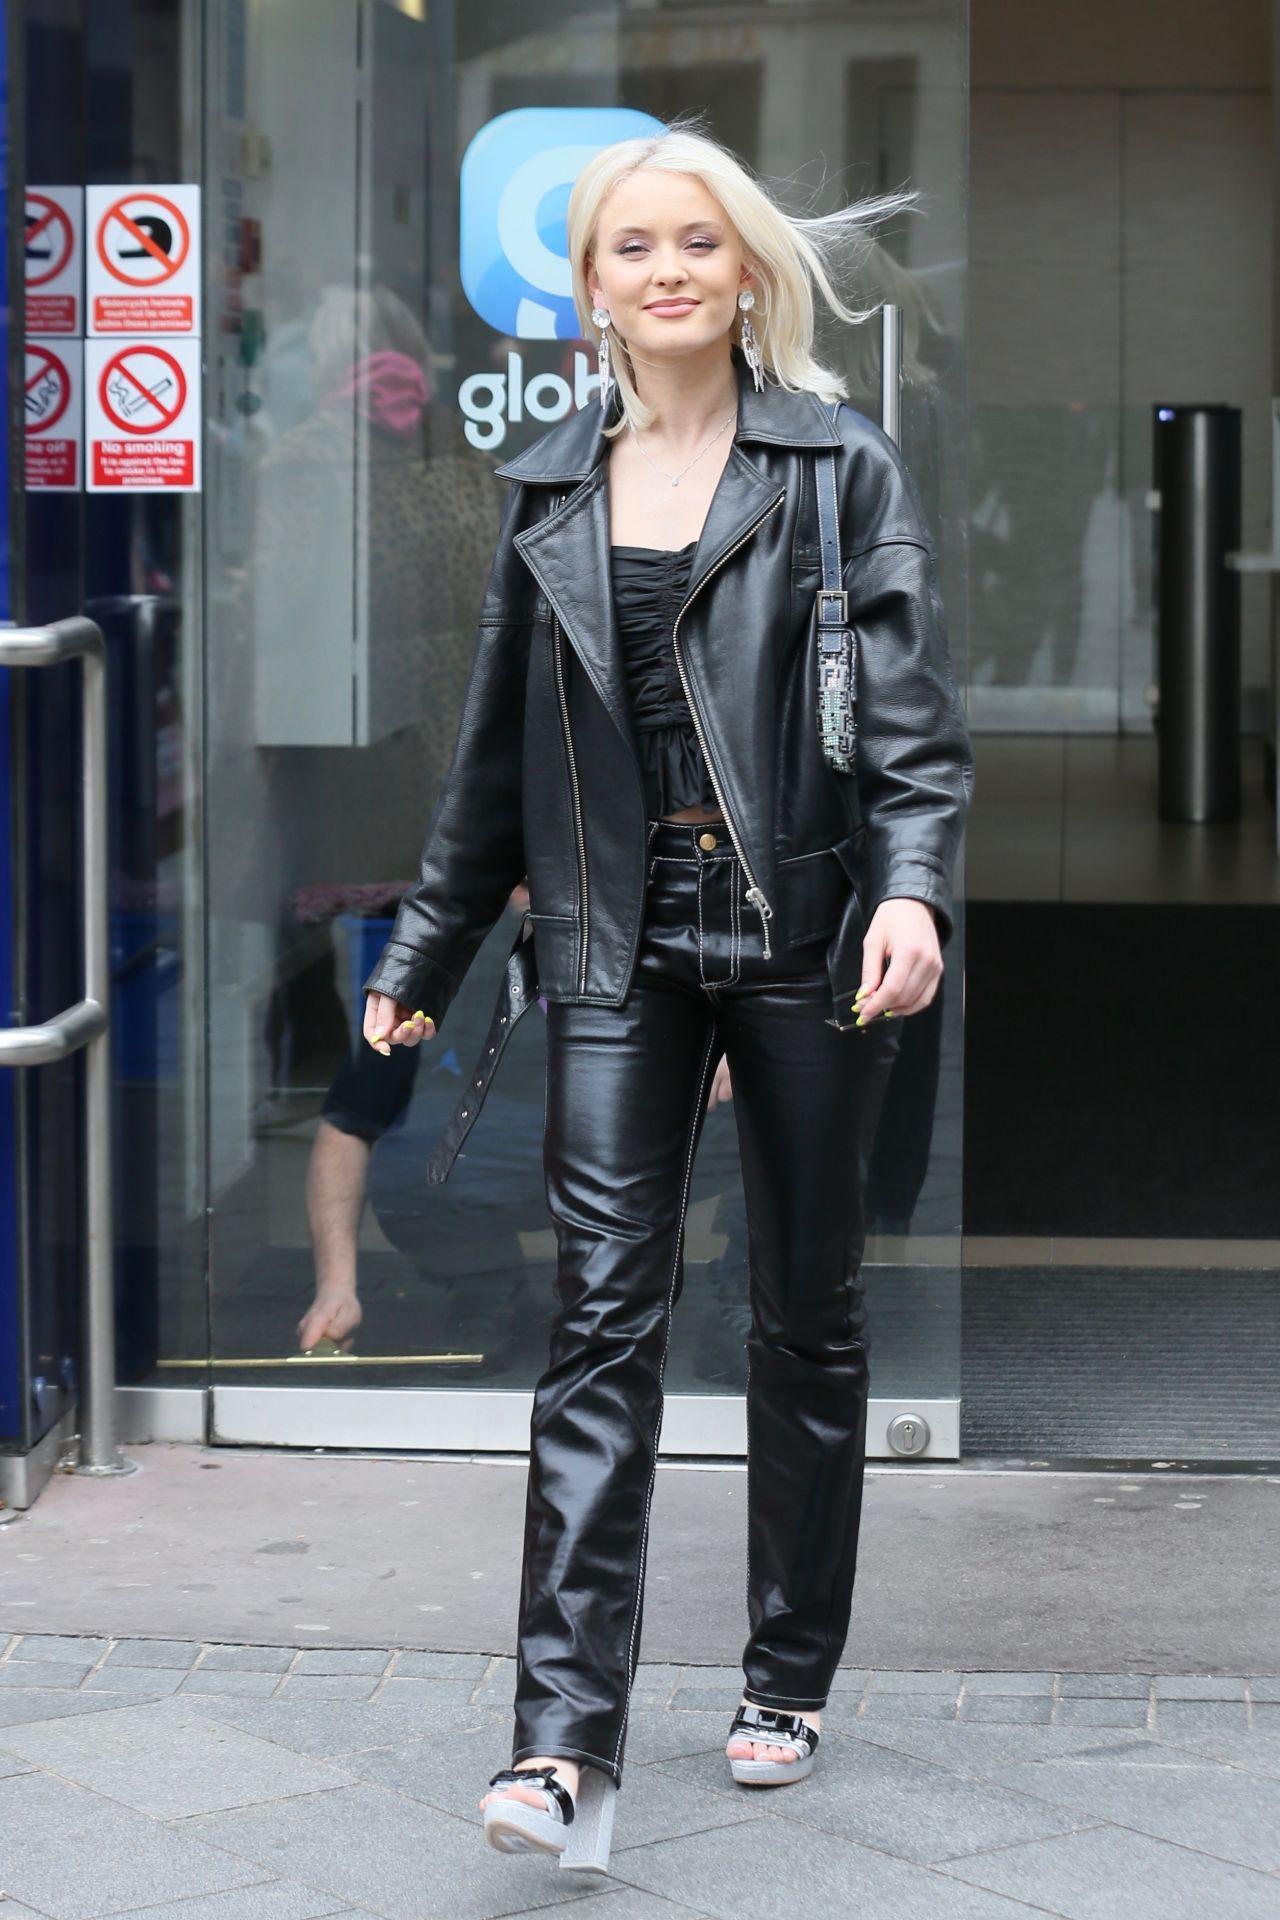 Zara Larsson at Global Studios in London 03/27/2019 ...